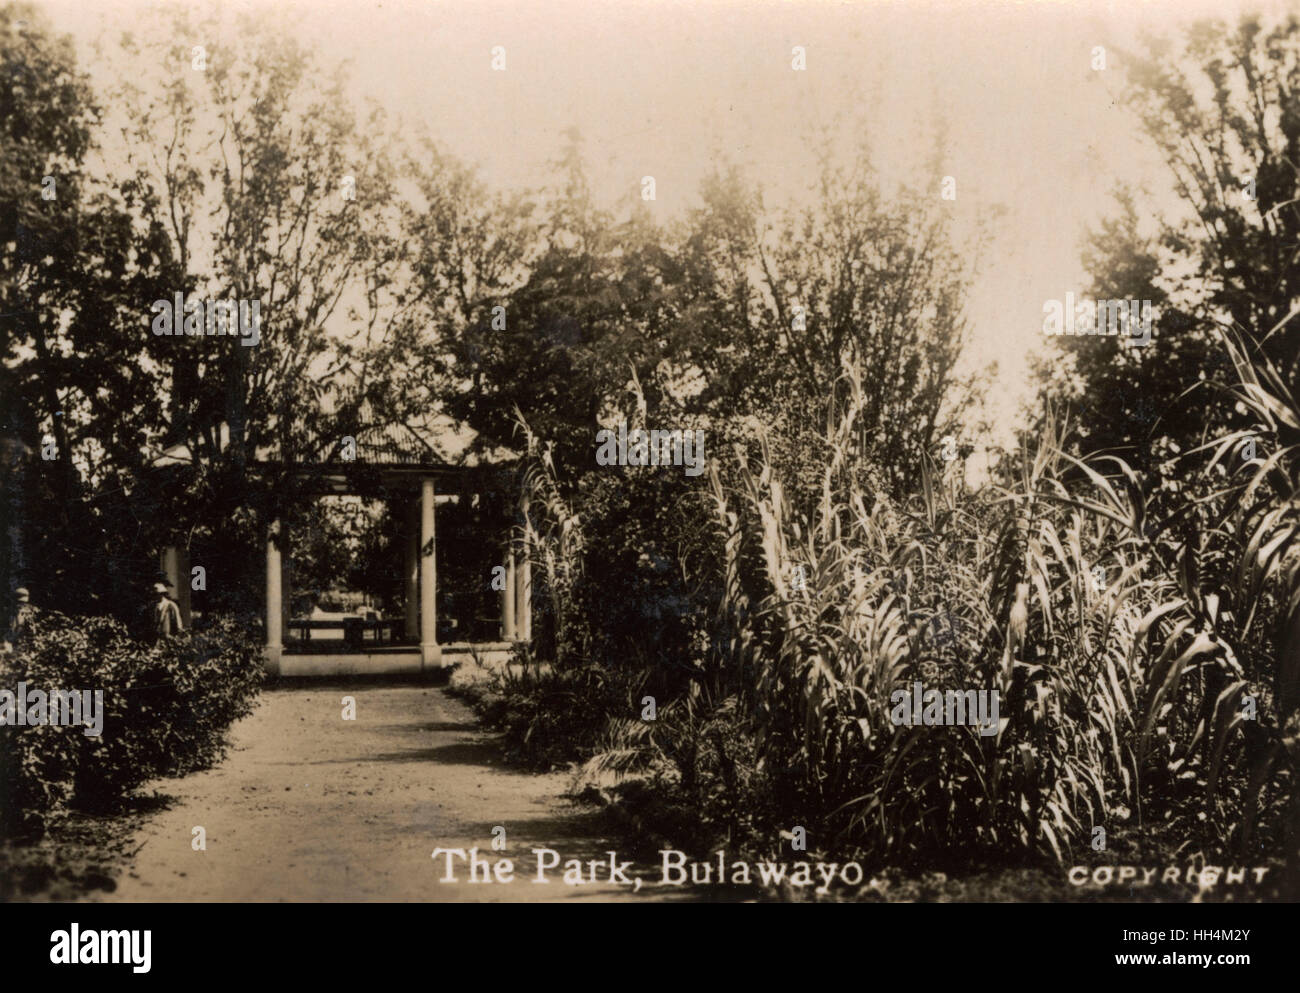 The Park, Bulawayo, Southern Rhodesia (now Zimbabwe). - Stock Image